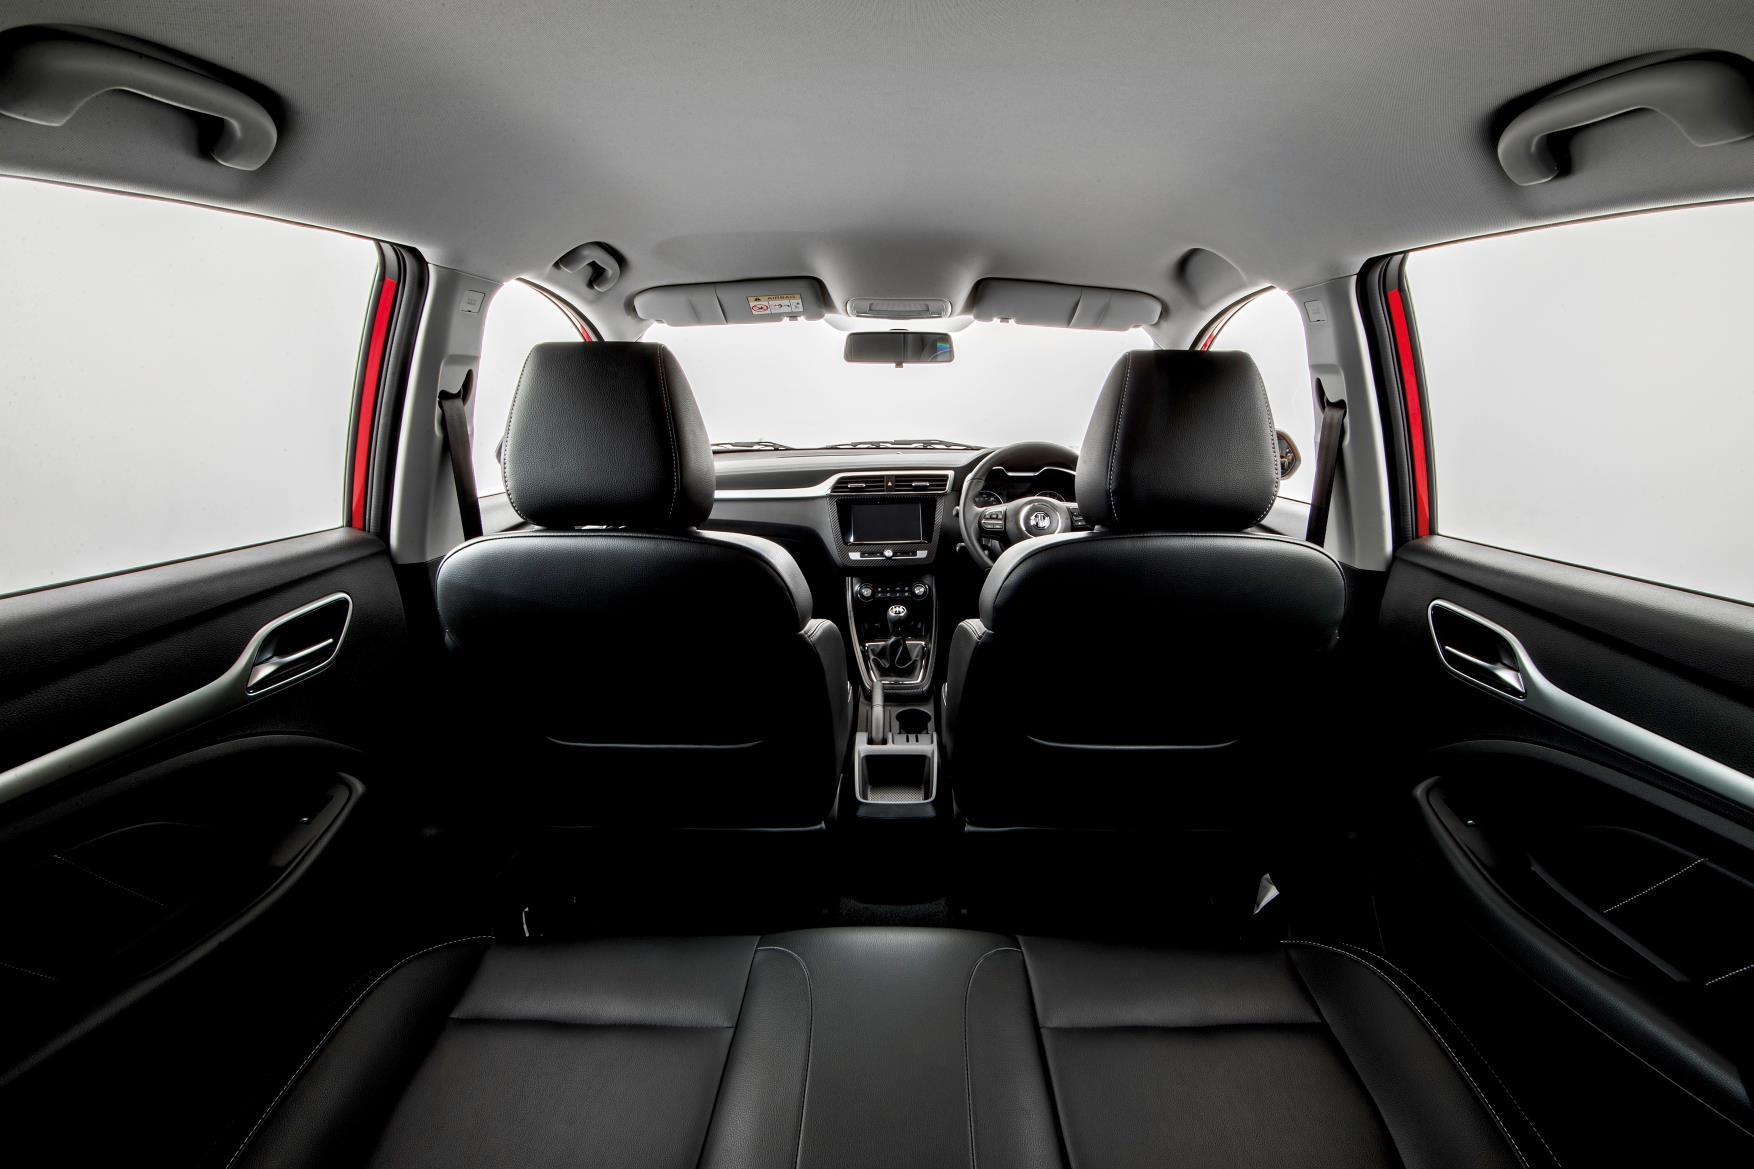 THE MG ZS PACT SUV myAutoWorld